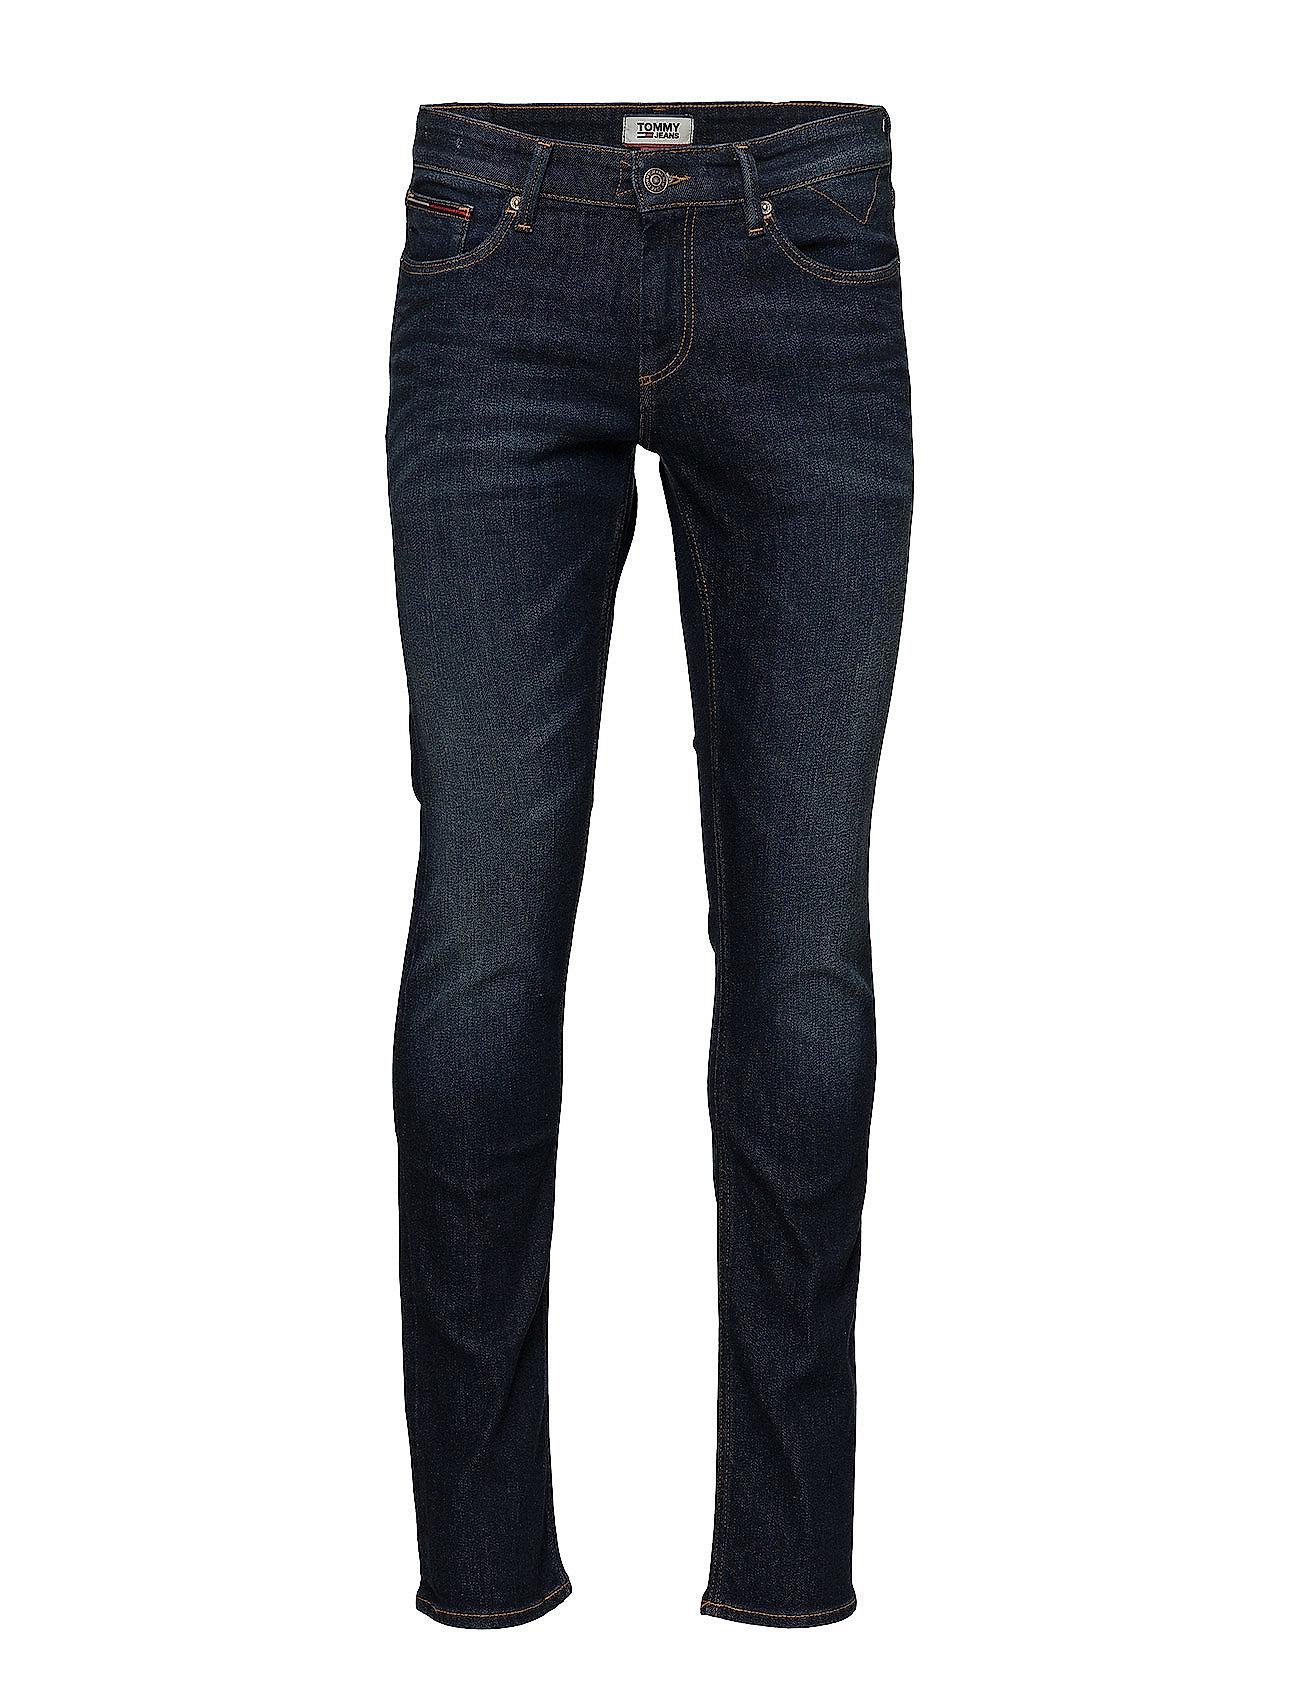 Tommy Jeans SLIM SCANTON DACO - DARK COMFORT